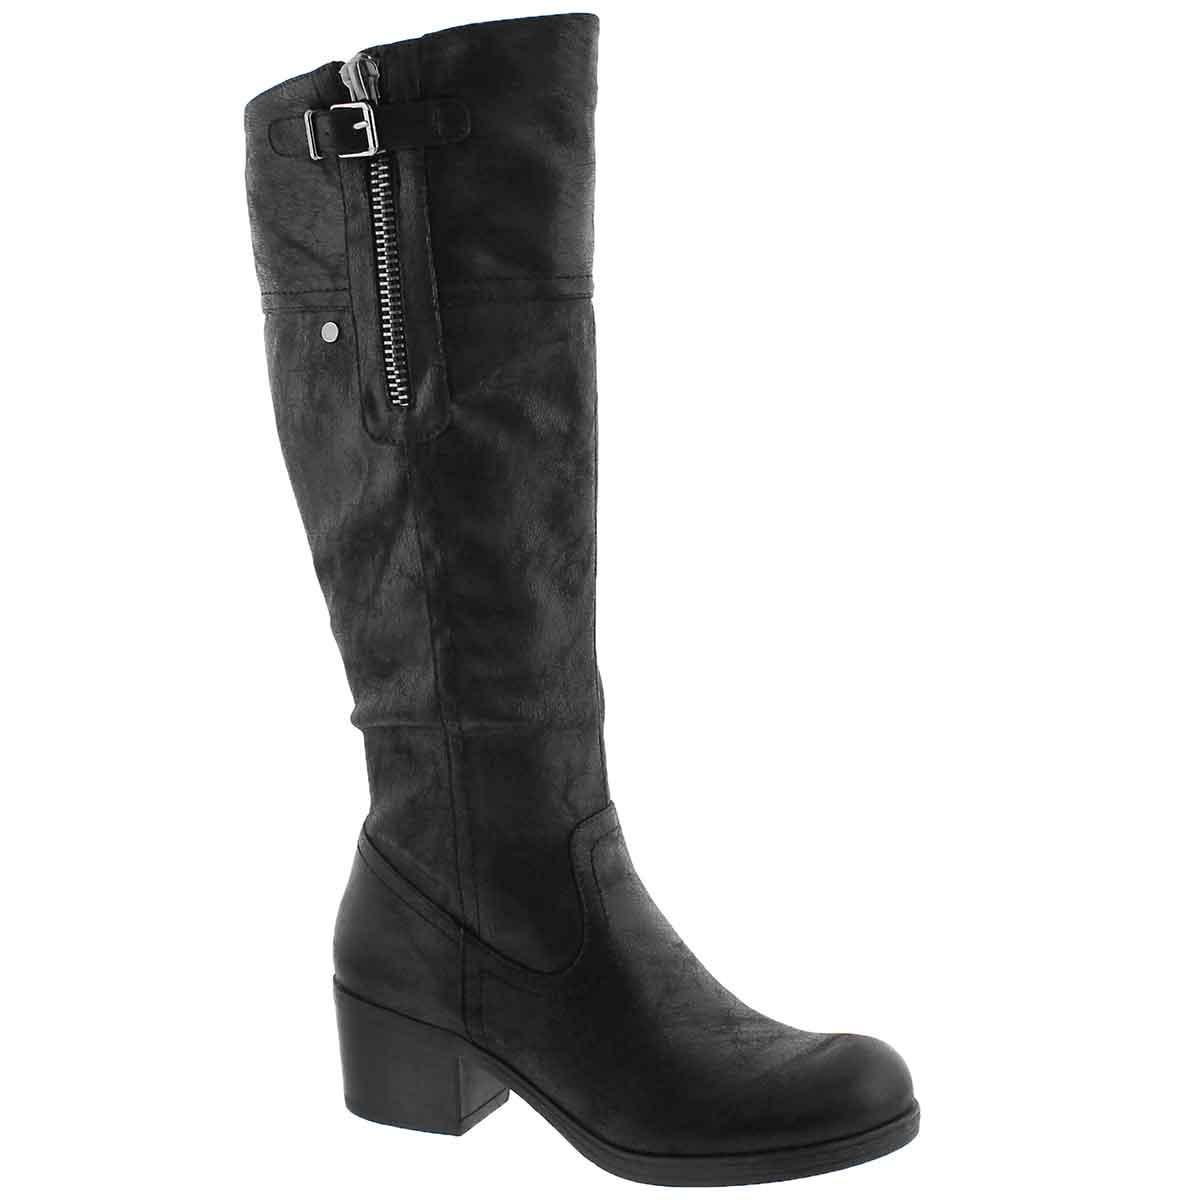 Women's BRIELLA black knee high casual boots